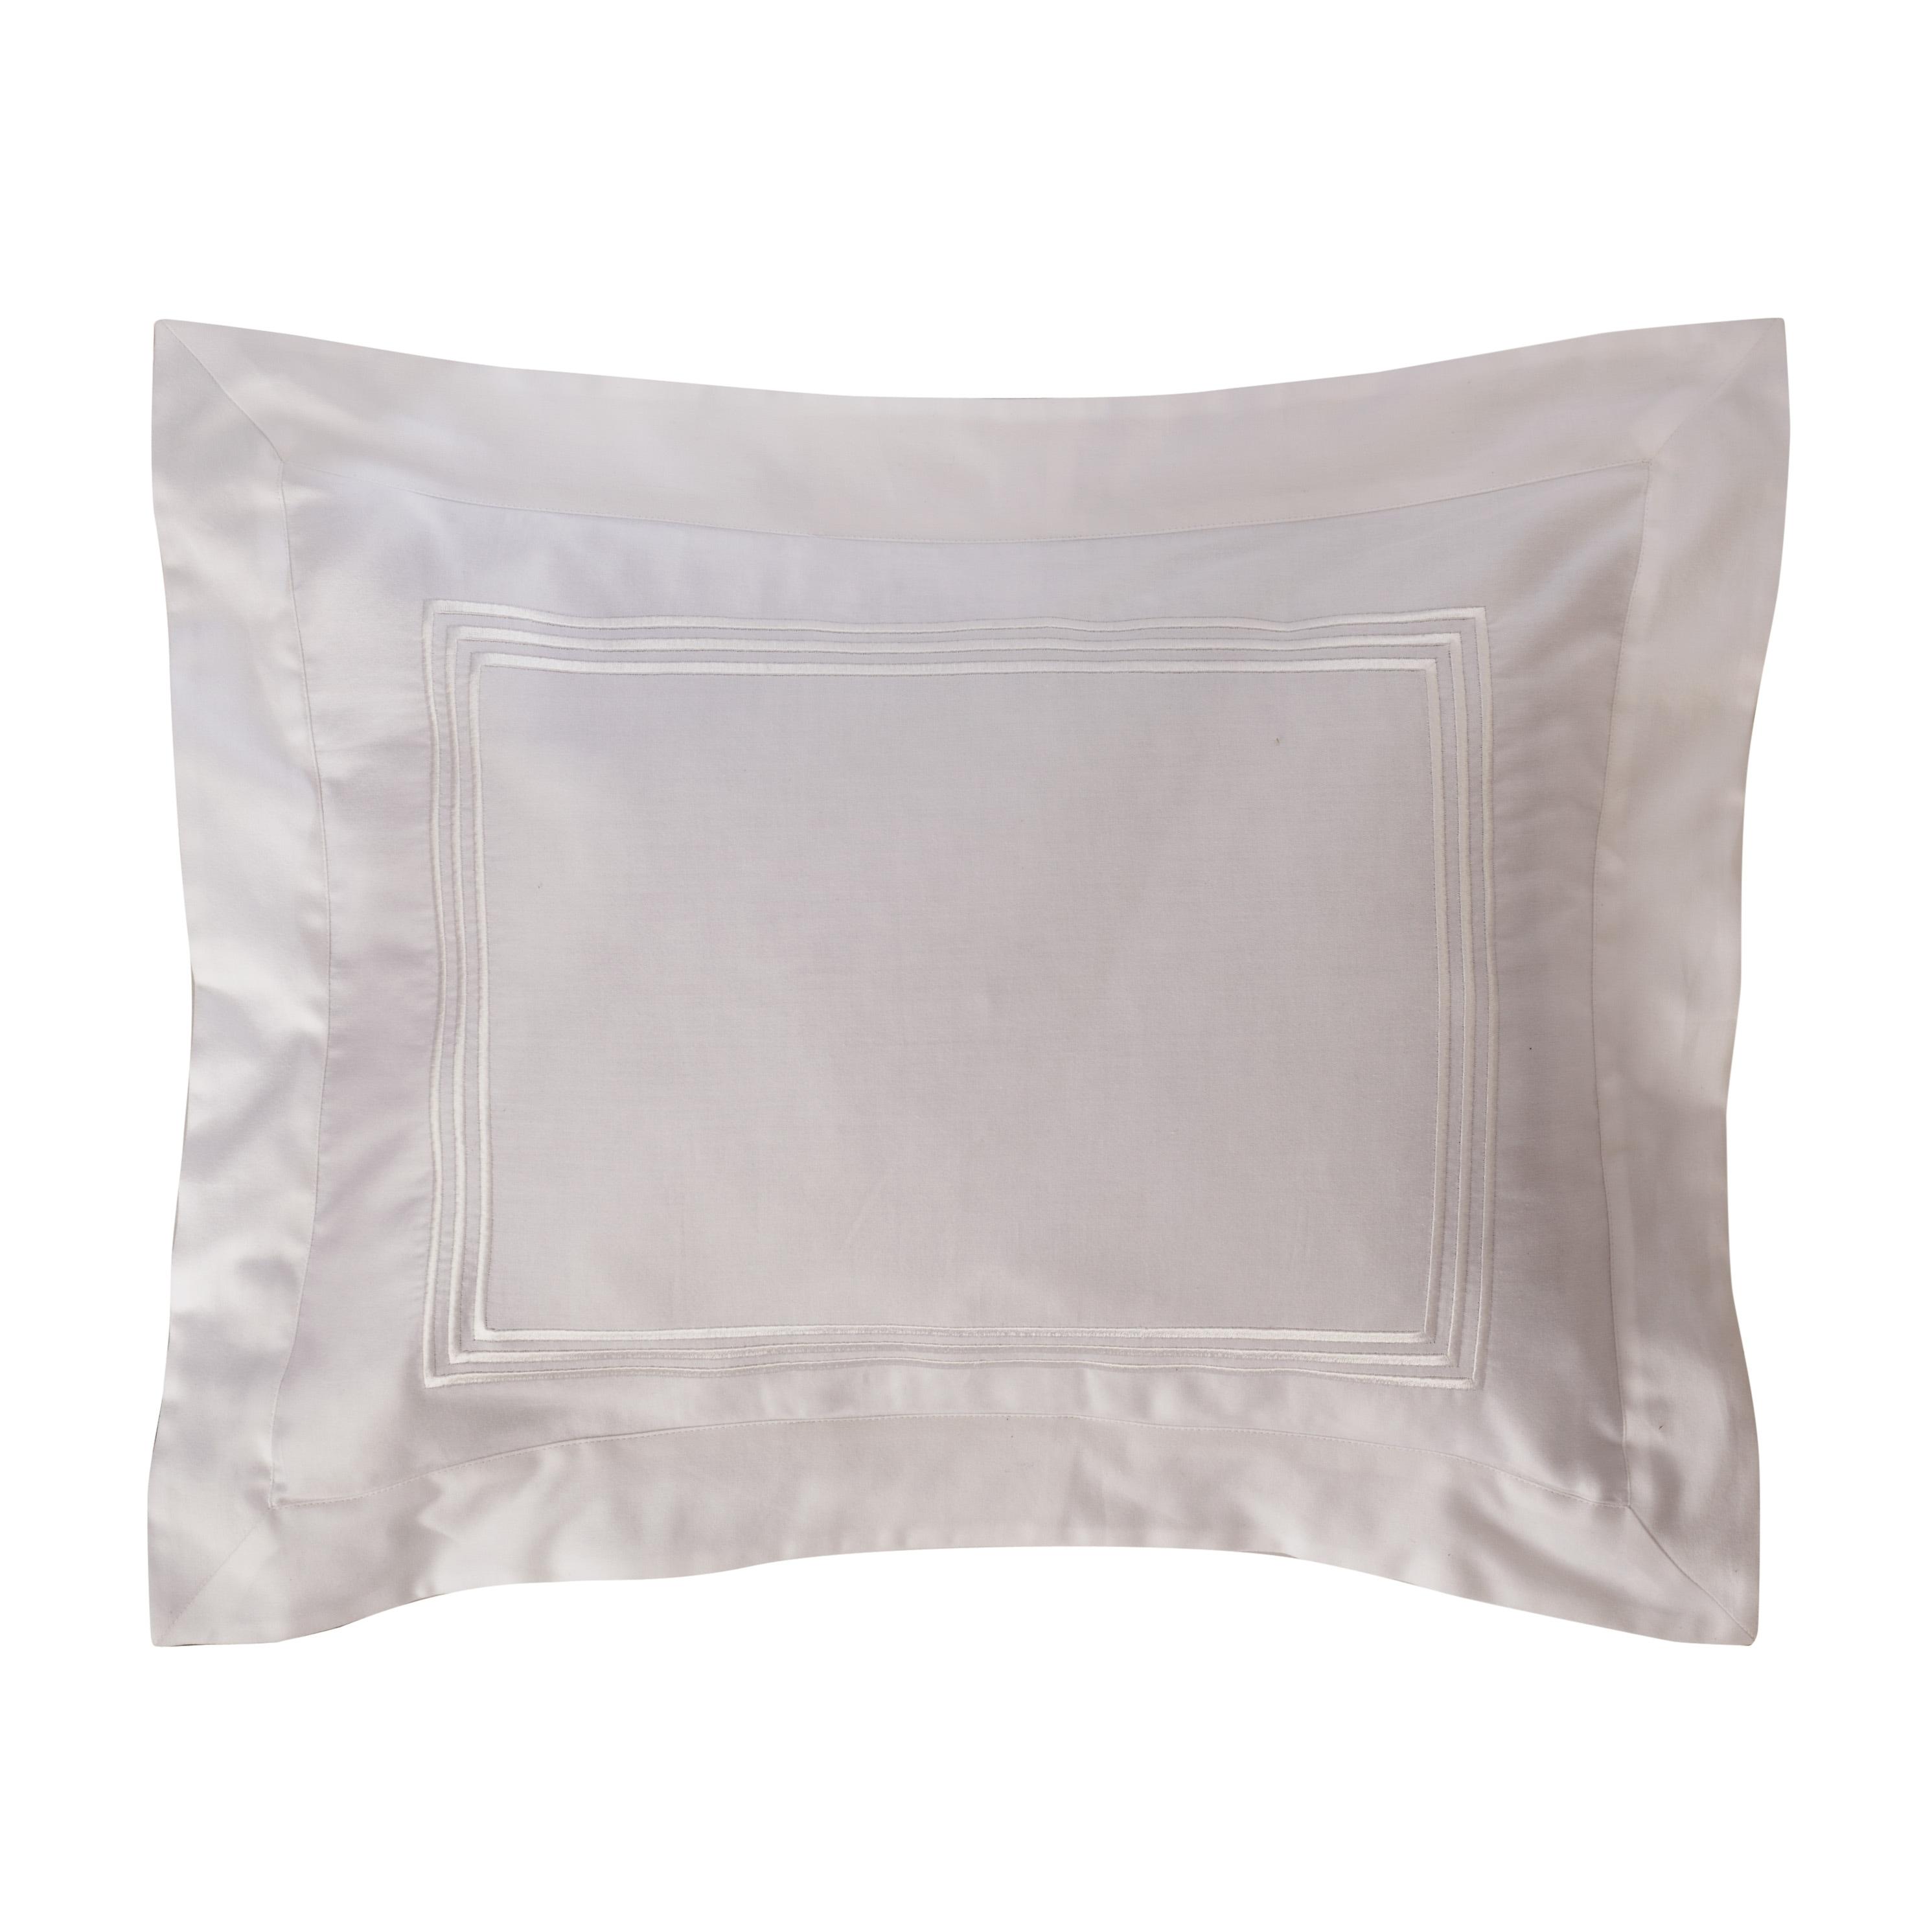 Roxbury Park Embroidered White Baratto Stripe Filled Decorative Pillow